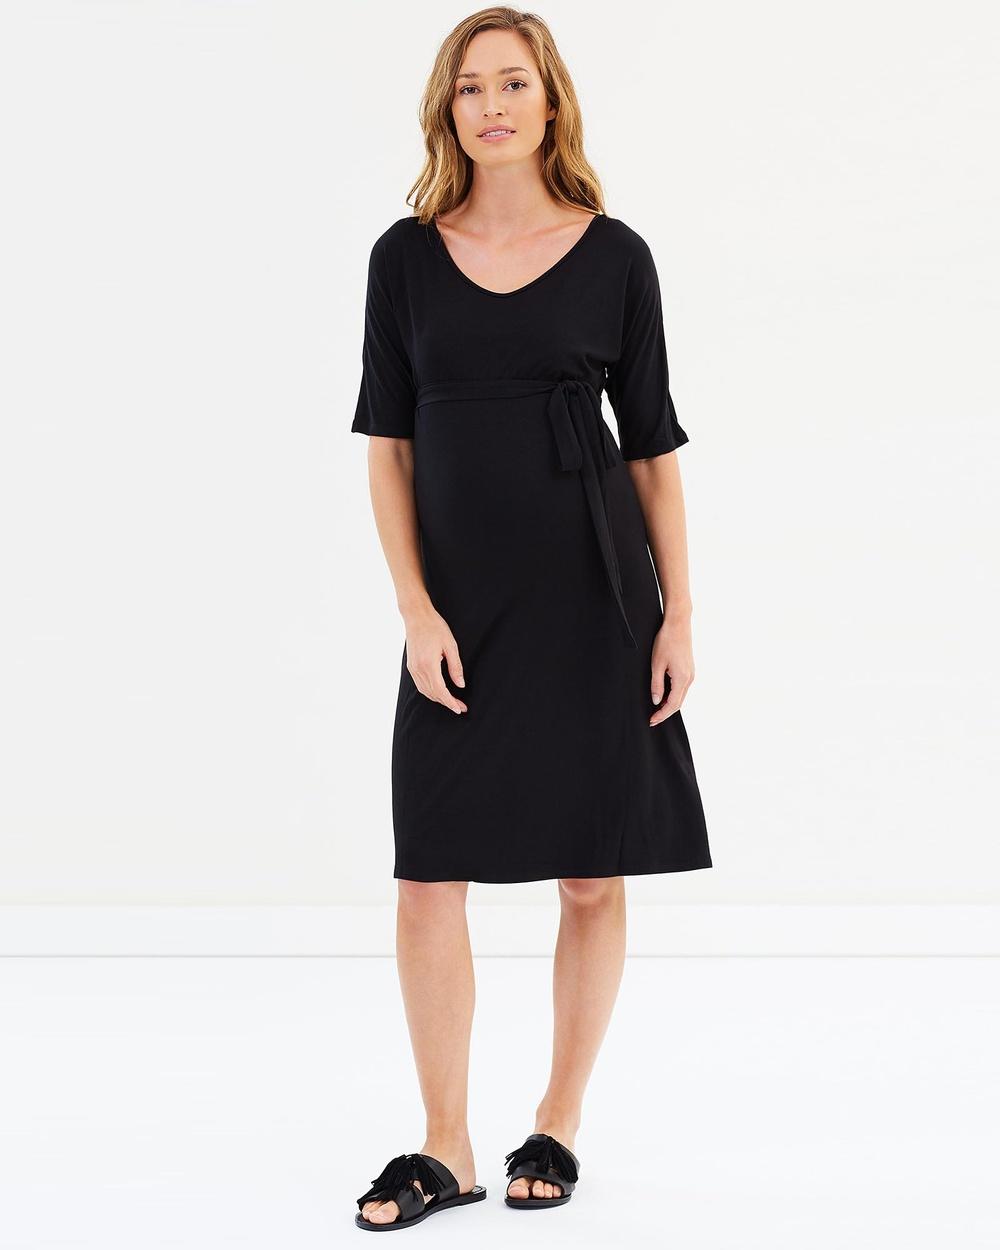 Bamboo Body Gemma Bamboo Dress Dresses Black Gemma Bamboo Dress